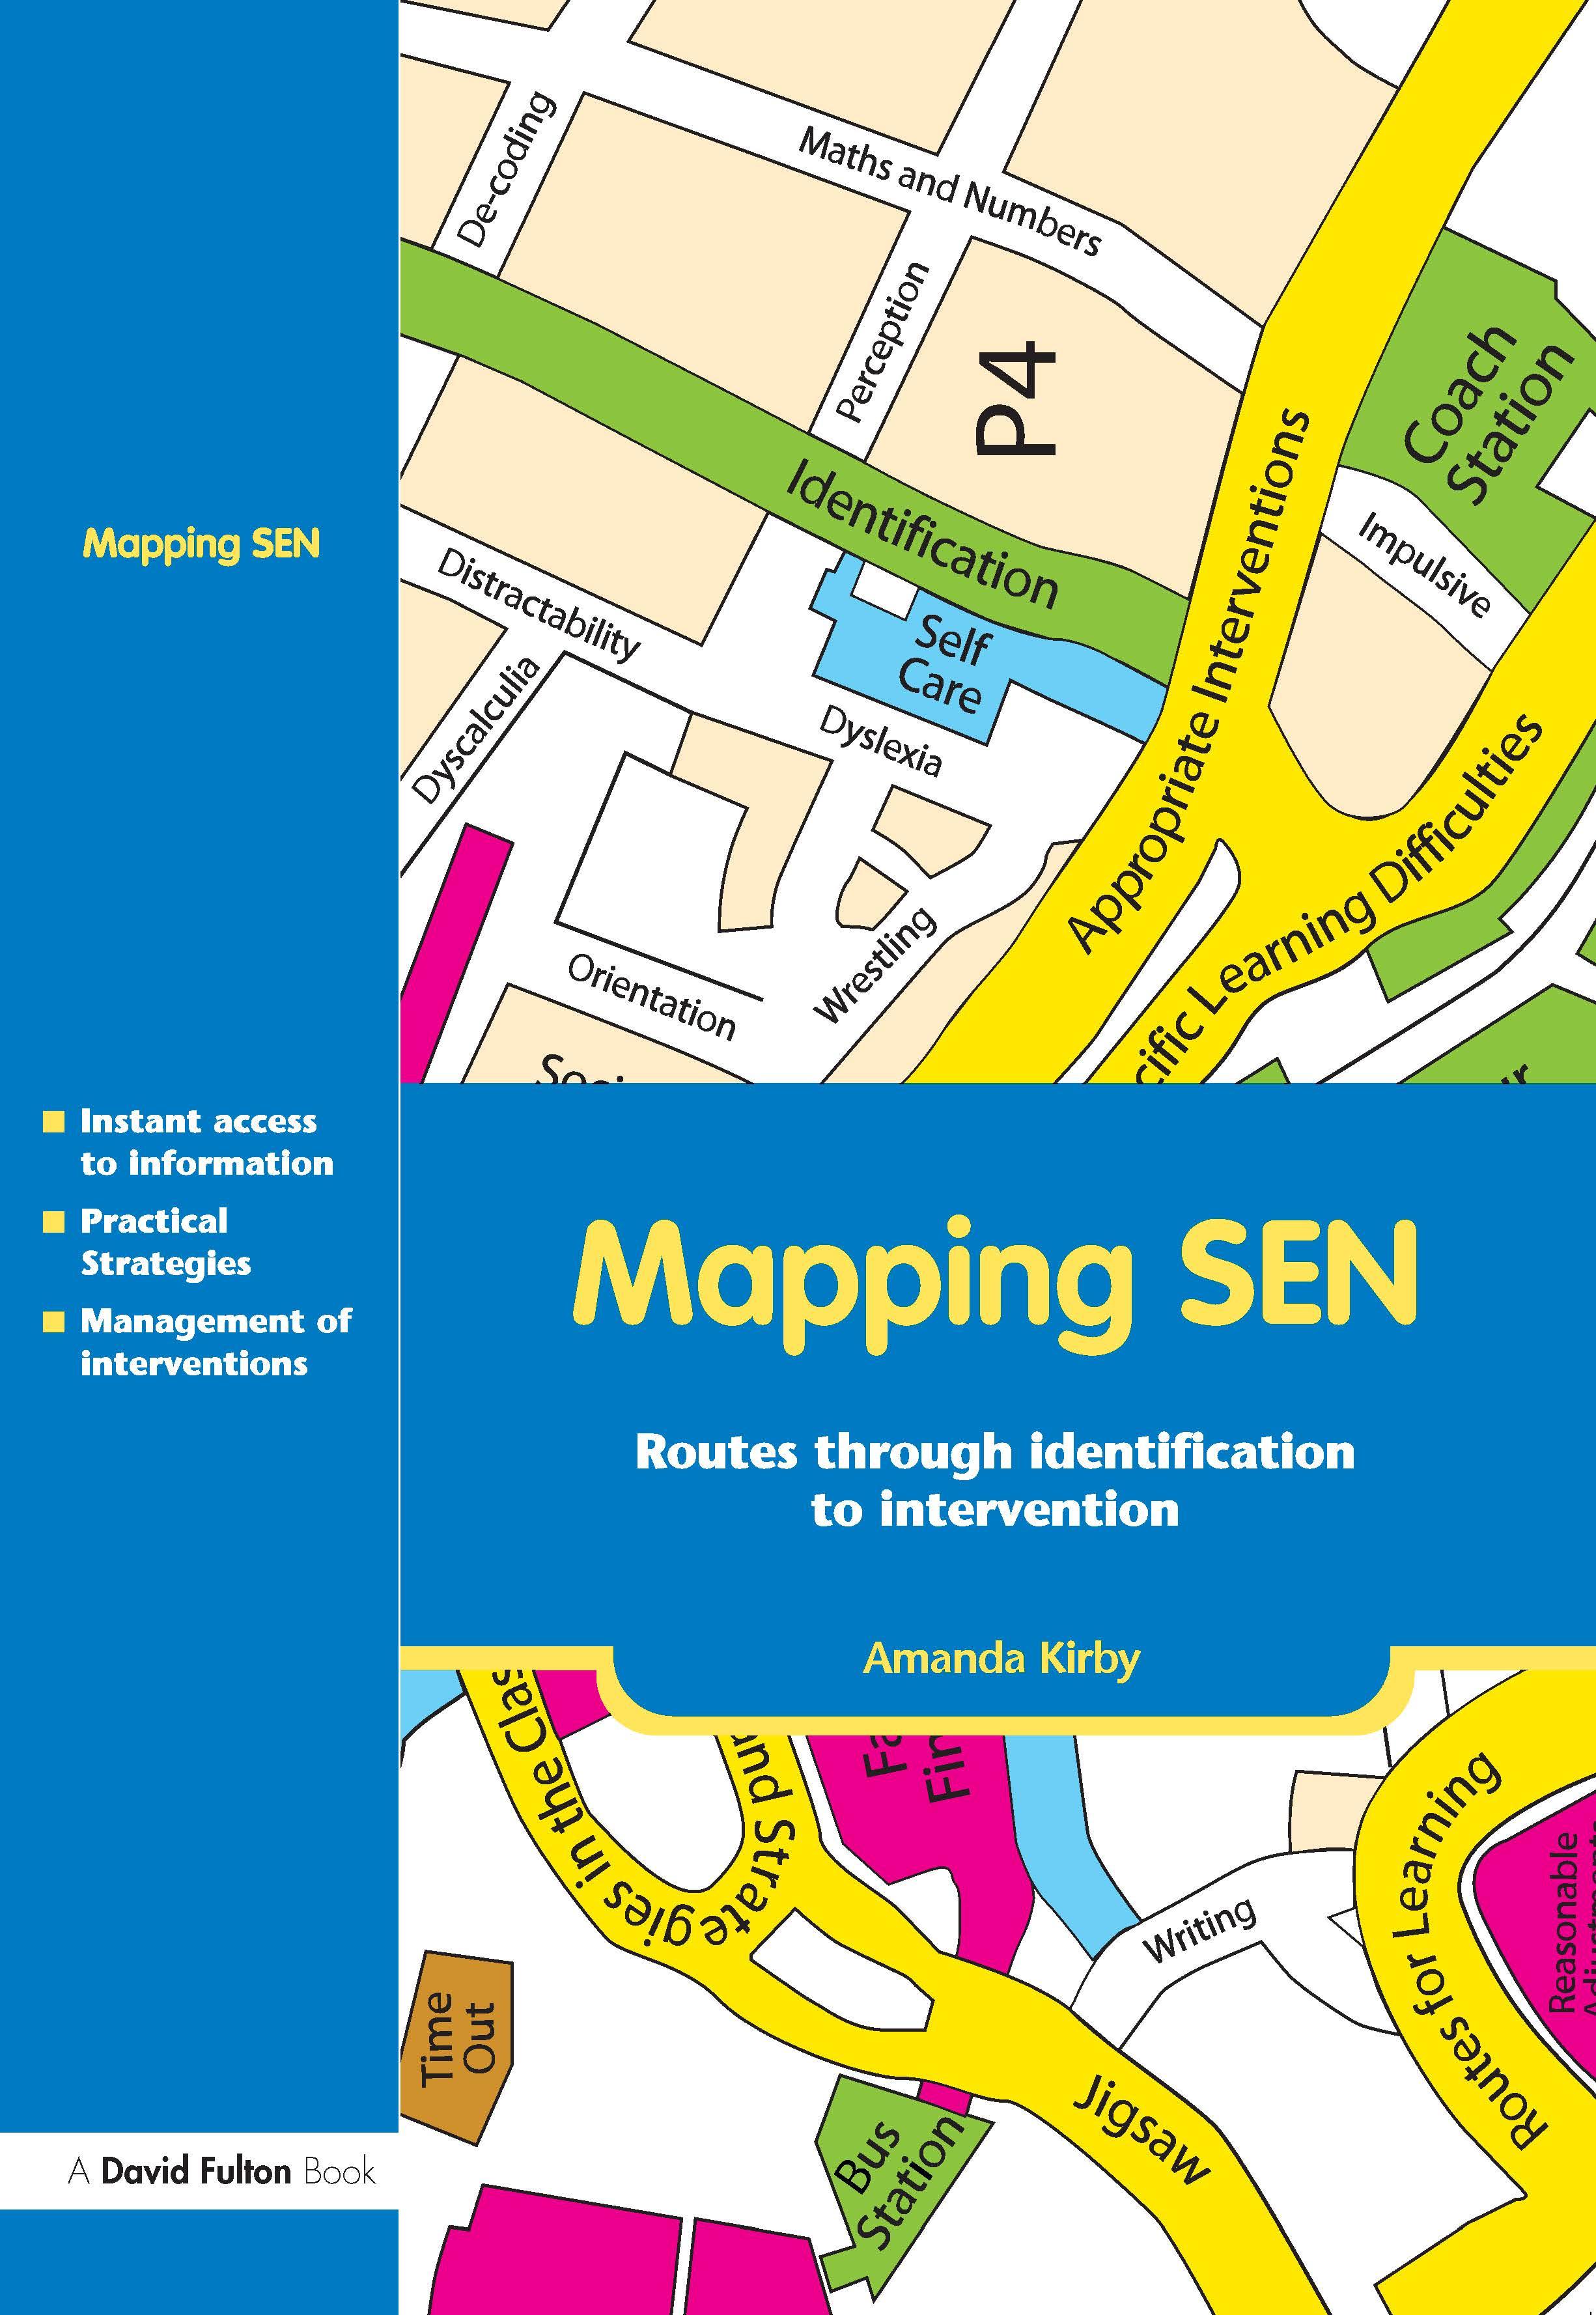 Mapping SEN